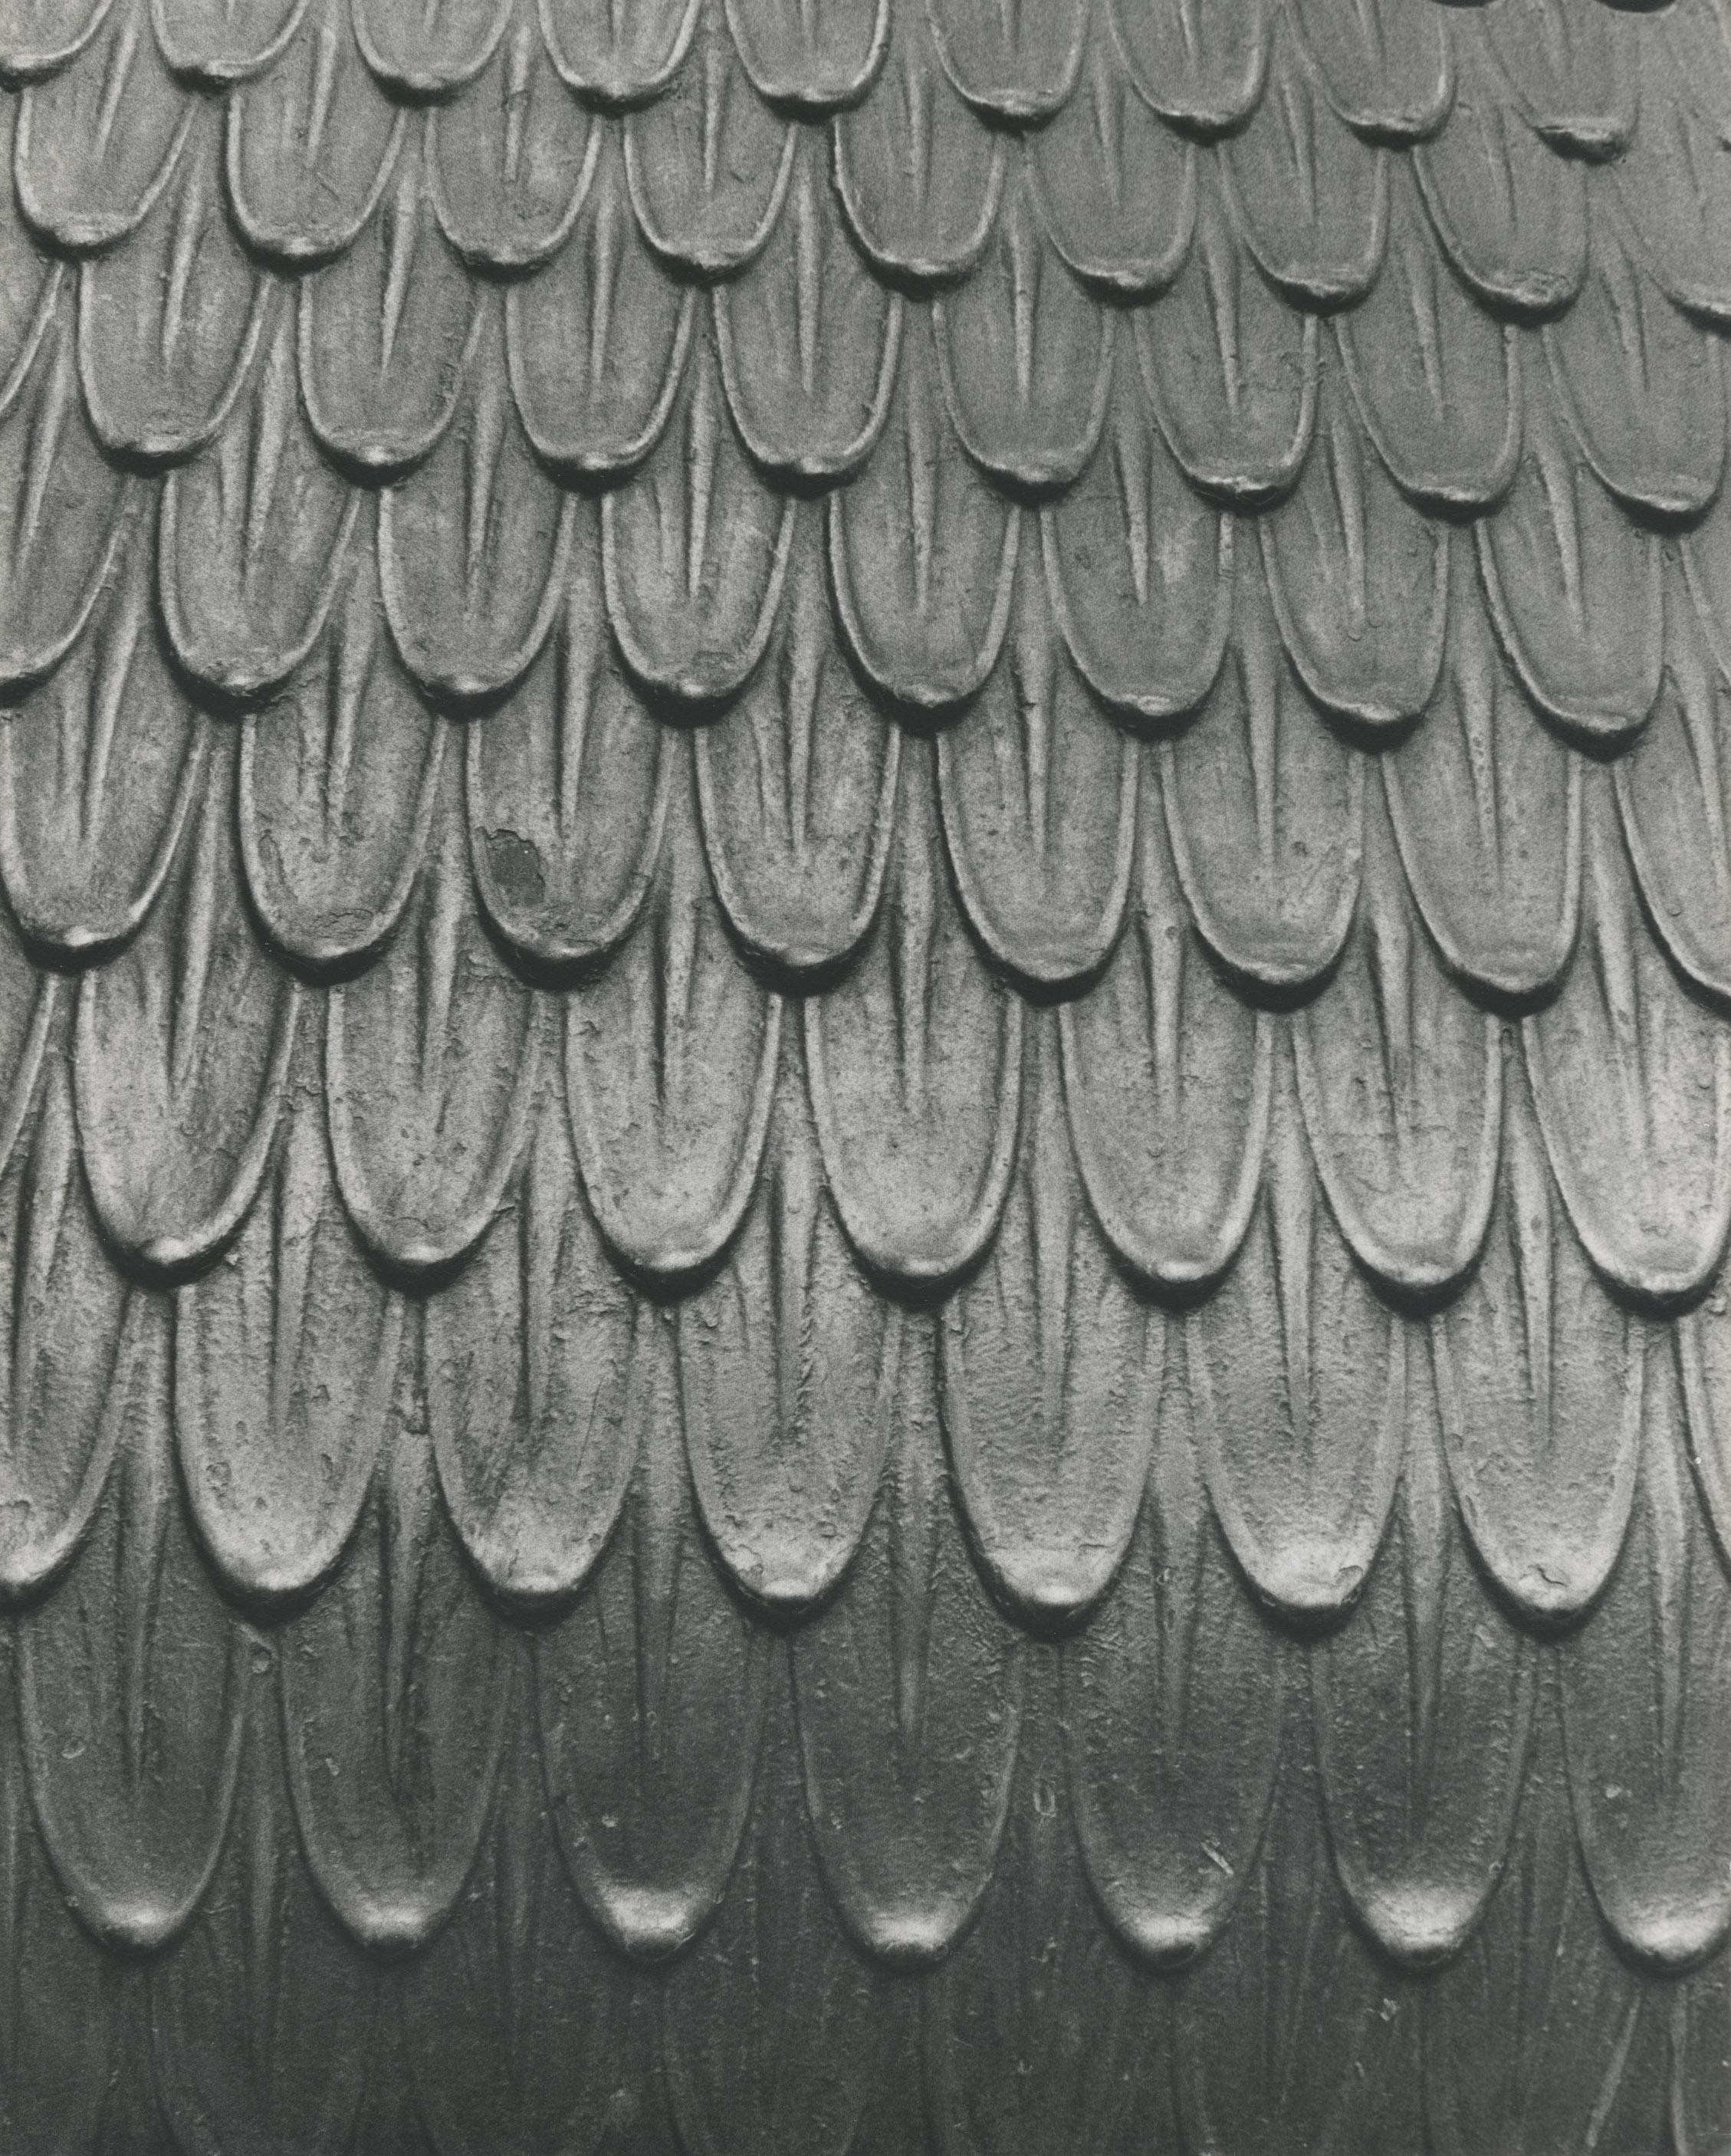 Mark Feldstein (1937-2001)   Untitled , circa 1970  vintage silver gelatin print 10 x 8 inches; 25.4 x 20.3 centimeters